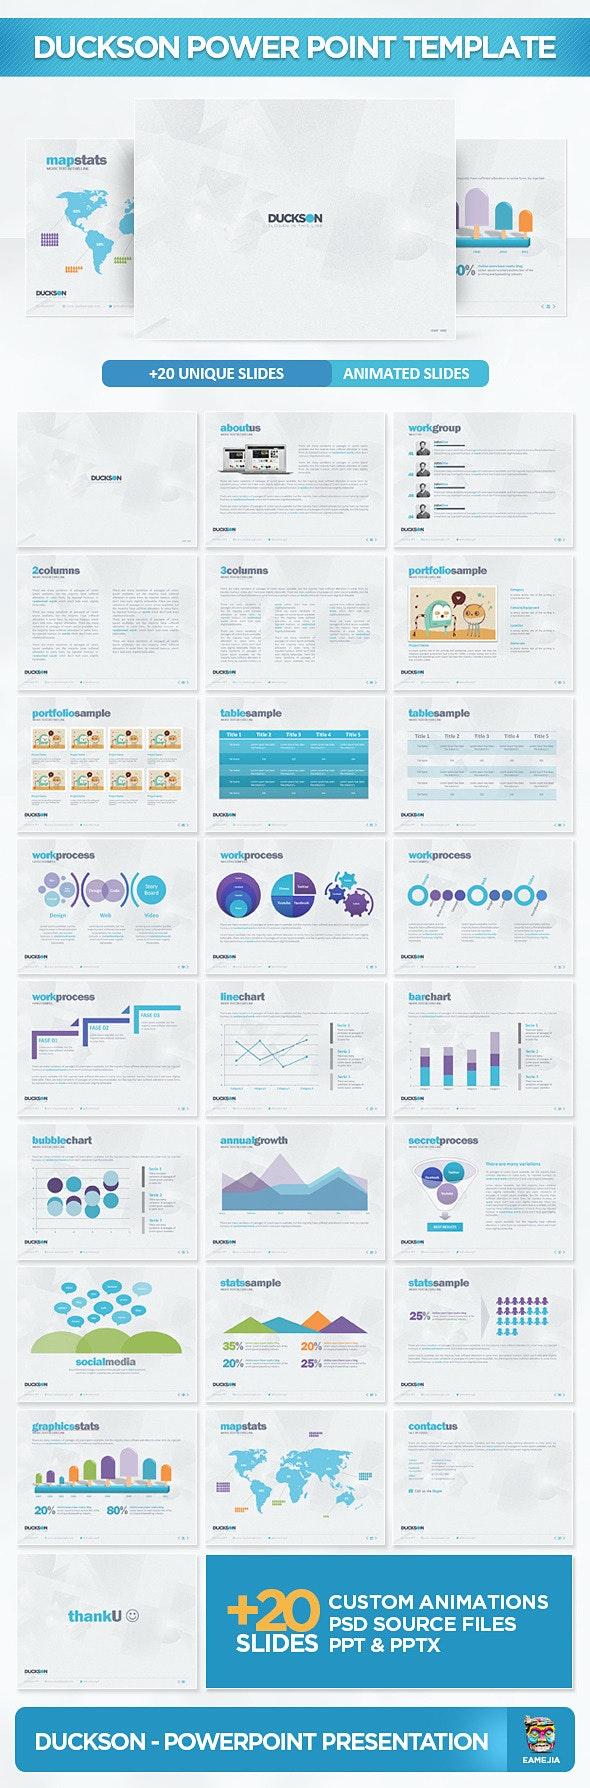 Duckson PowerPoint Presentation Template - PowerPoint Templates Presentation Templates